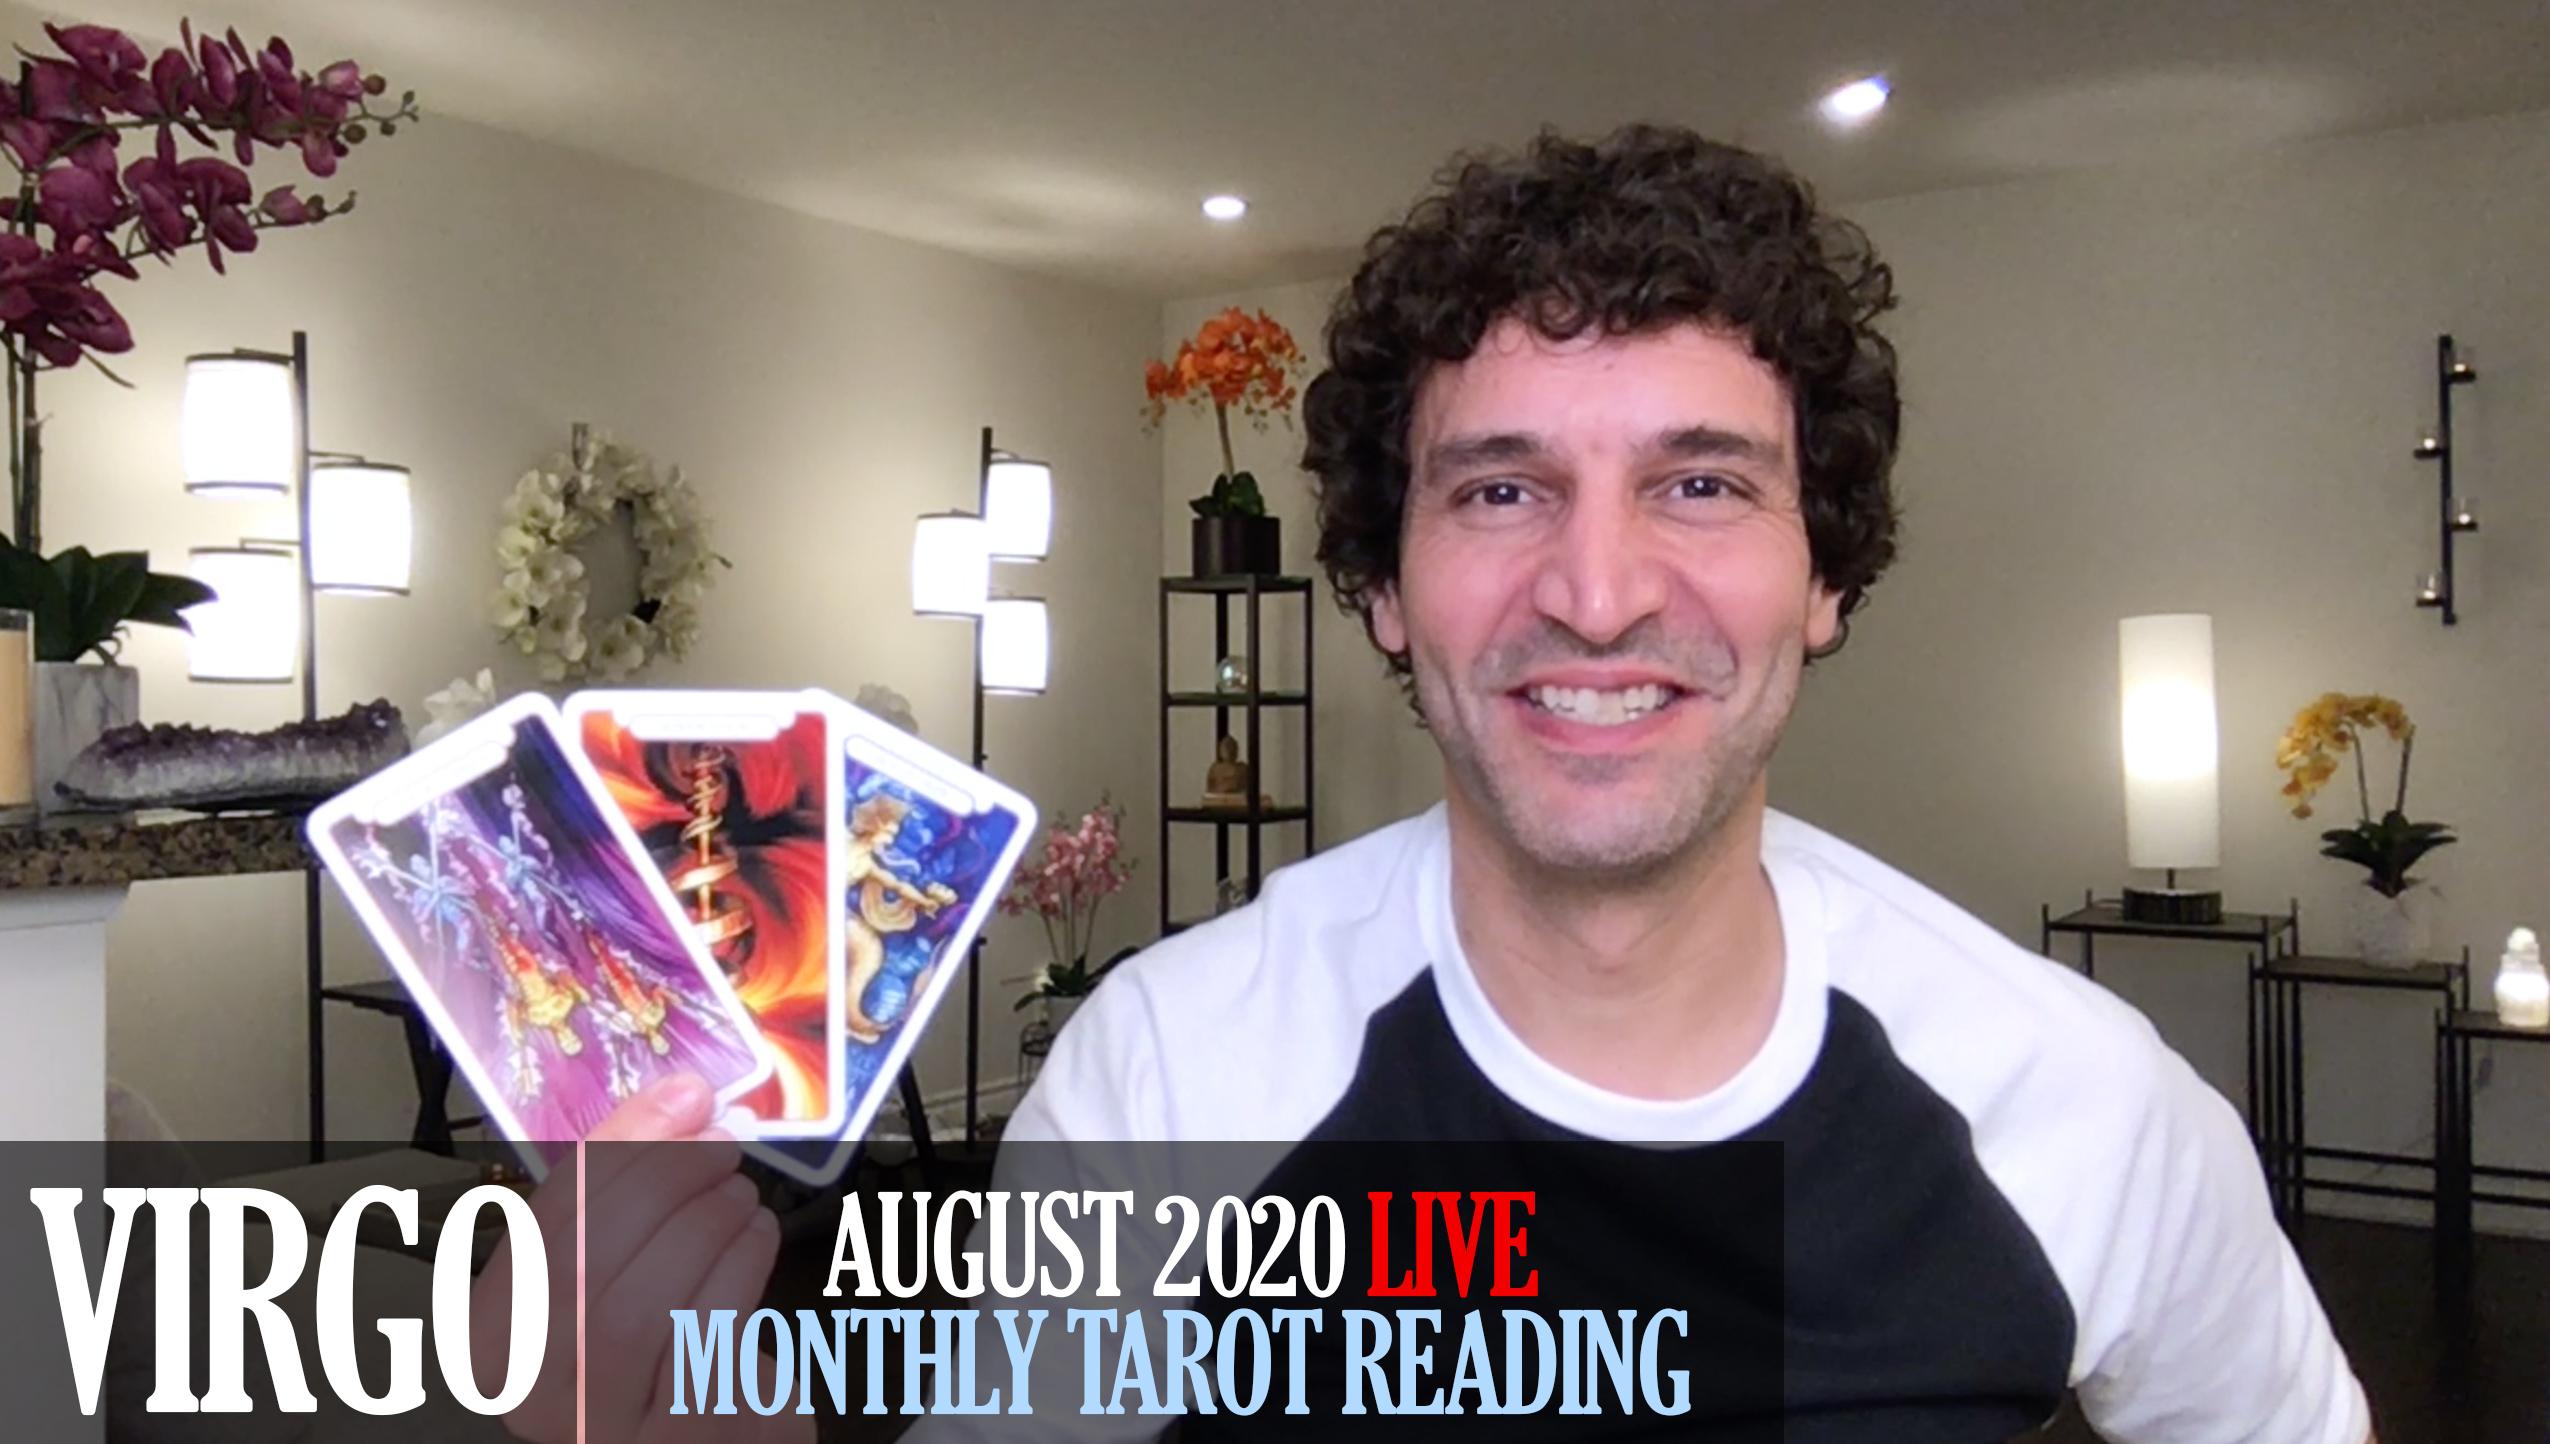 VIRGO August 2020 Tarot Reading